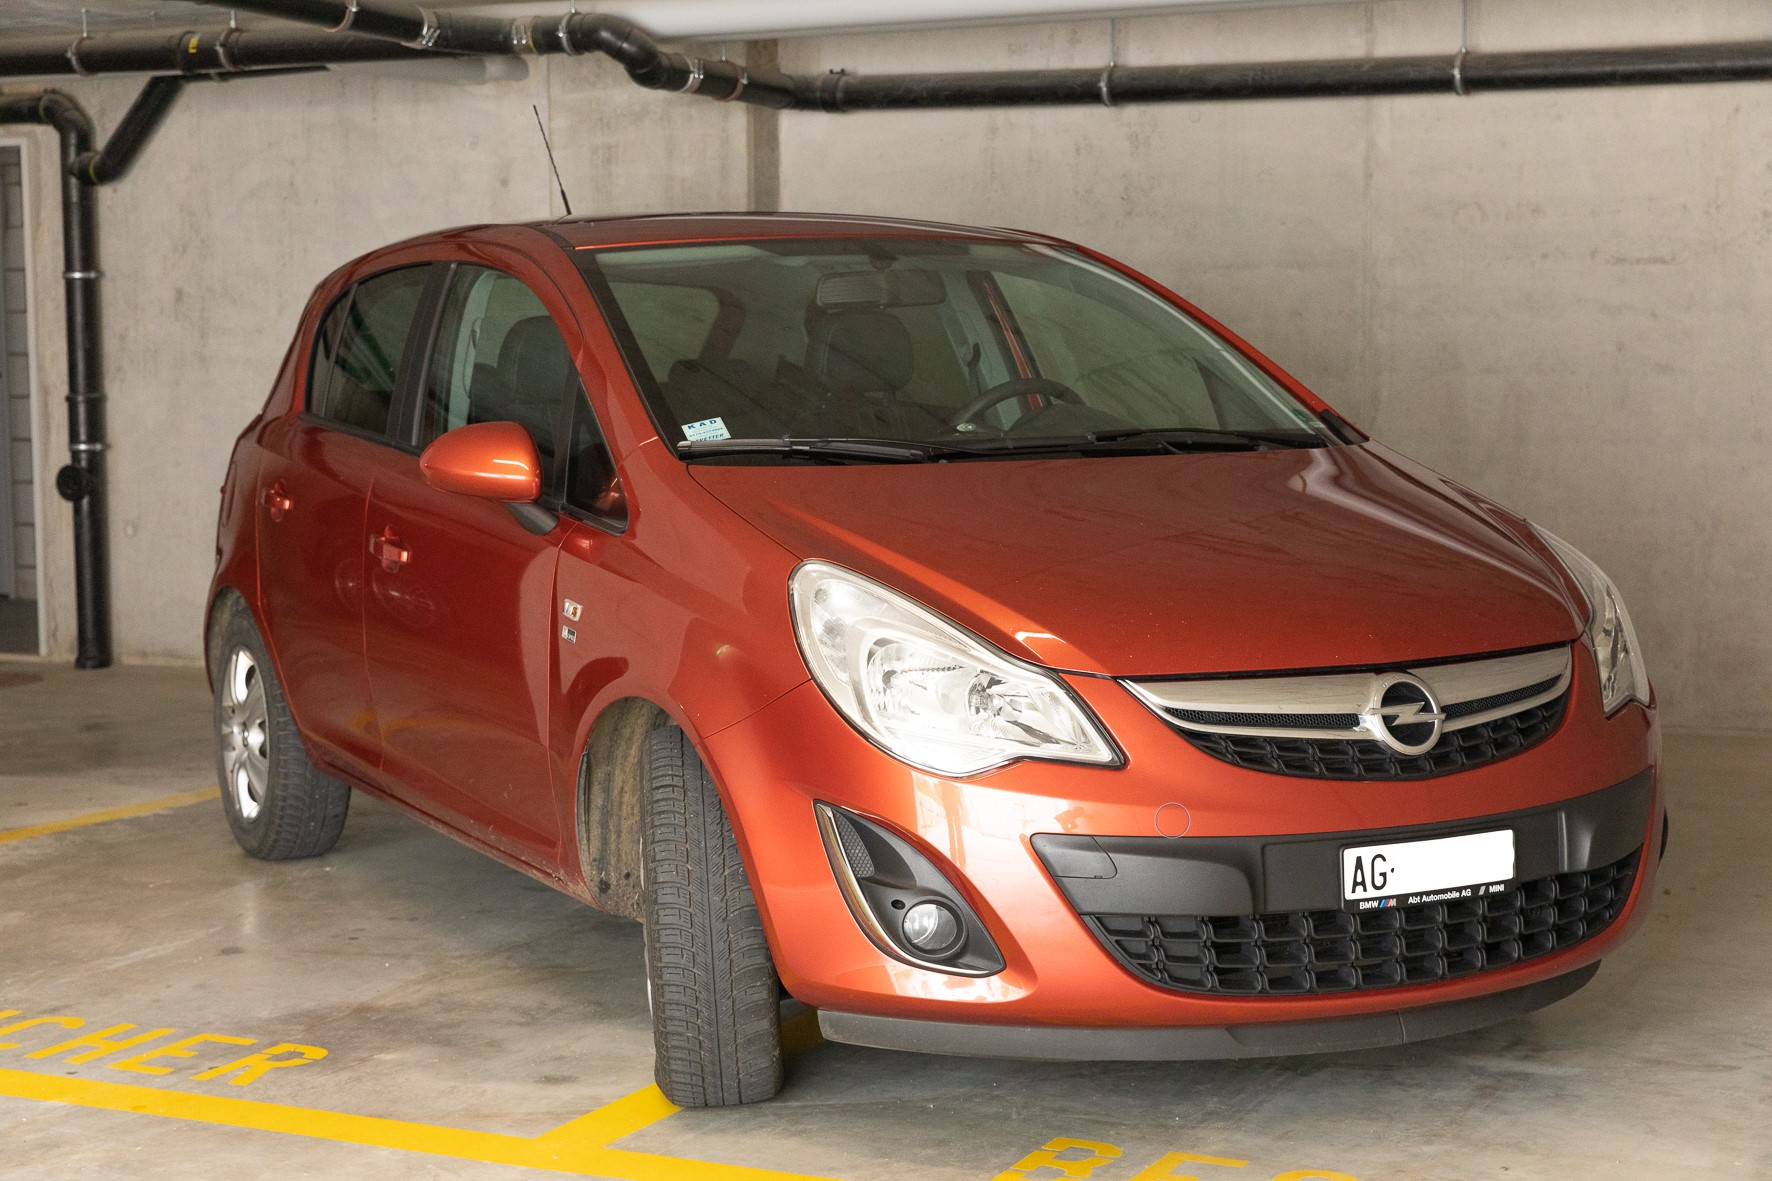 saloon Opel Corsa 1.2i 16V TP Color Ed.